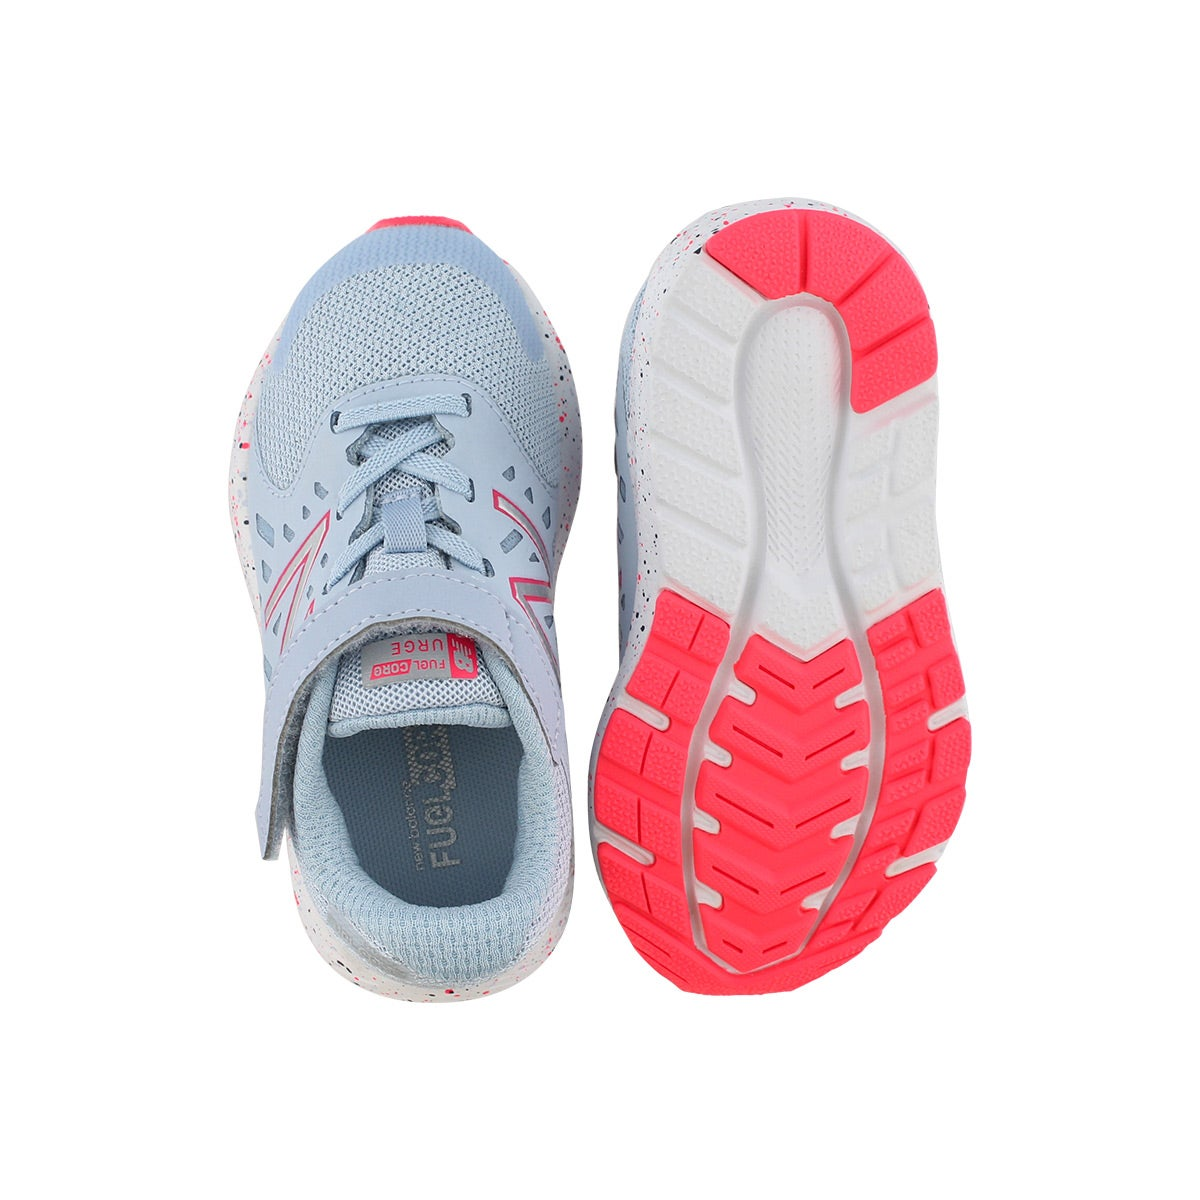 Infs-g Urge ice blue/pink sneaker